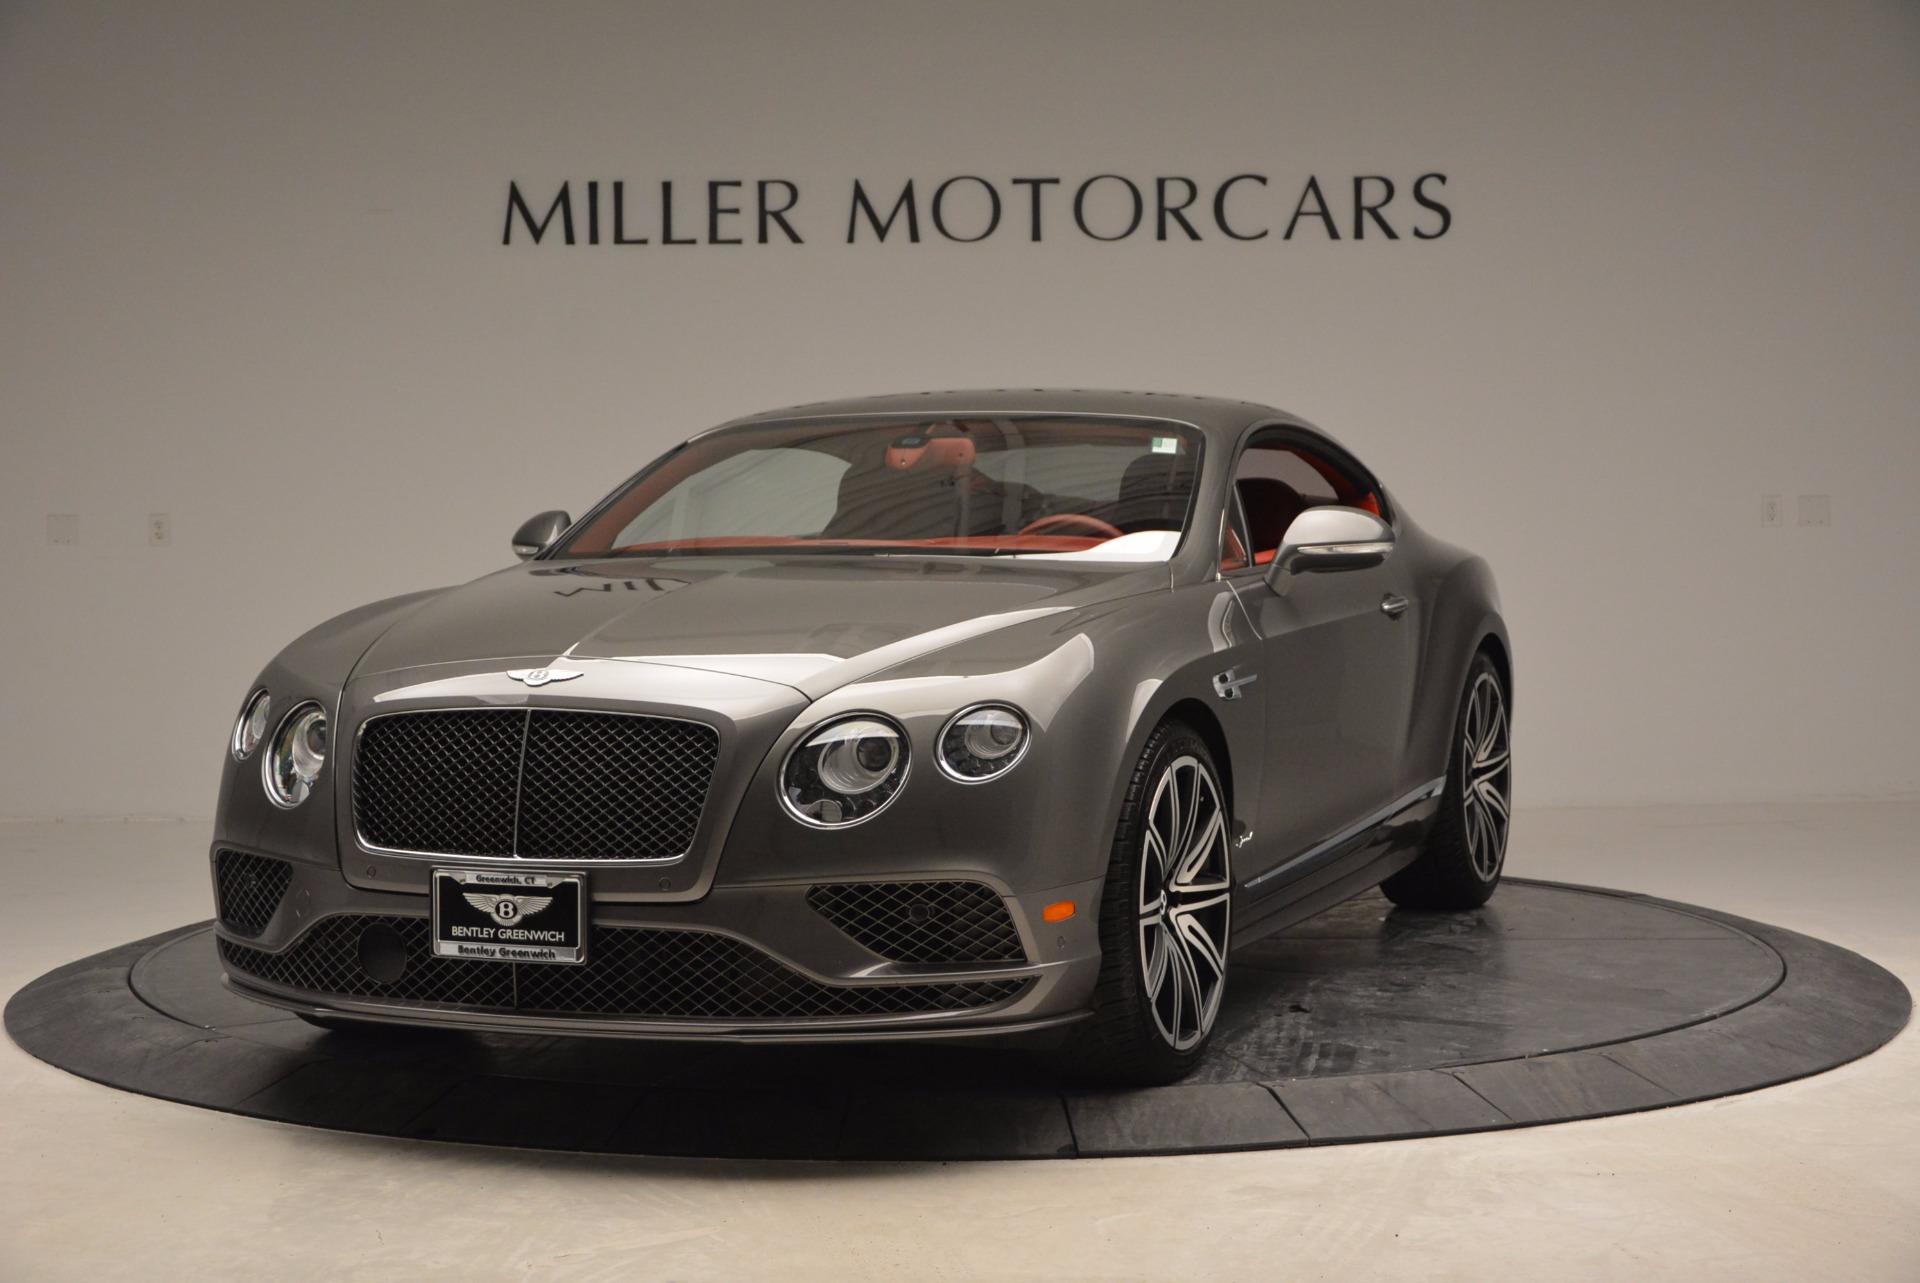 Used 2016 Bentley Continental GT Speed for sale Sold at Alfa Romeo of Westport in Westport CT 06880 1